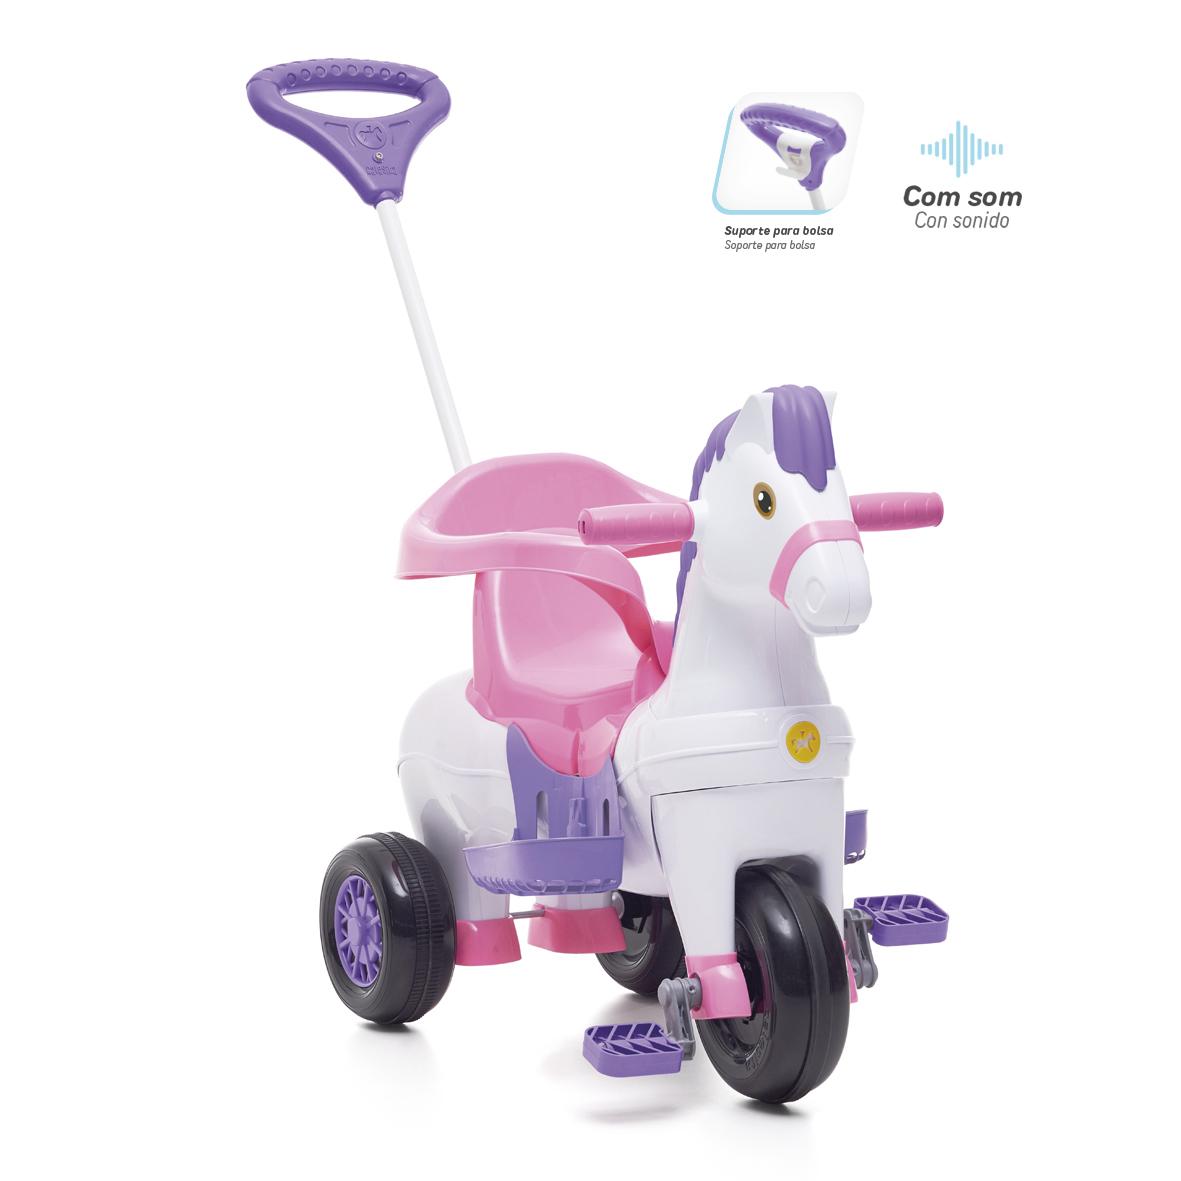 Triciclo Potó Rosa - Calesita 1012